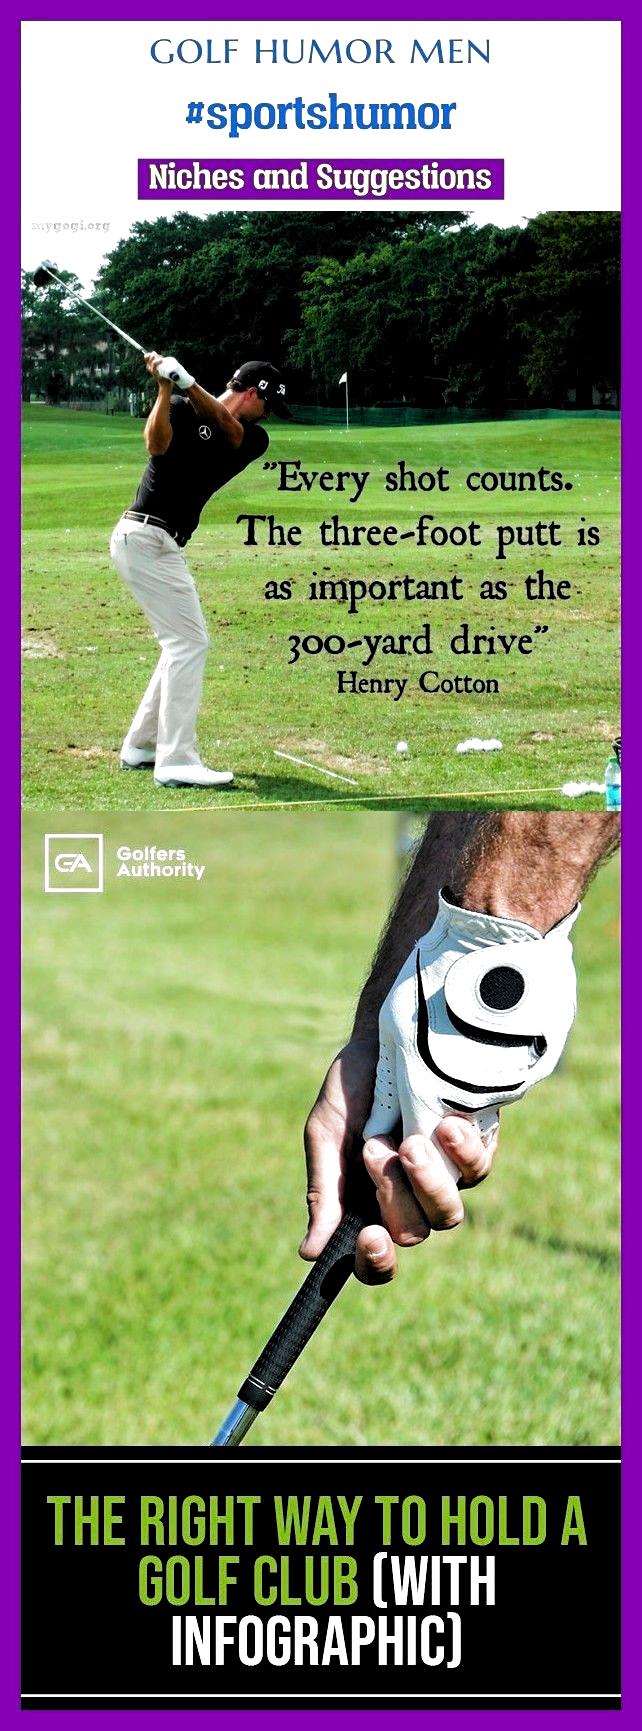 Golf Humor Men Sportshumor Seoforpinterest Seo Trending Golf Humor Funny G Golf Humor Golf Quotes Funny Humor